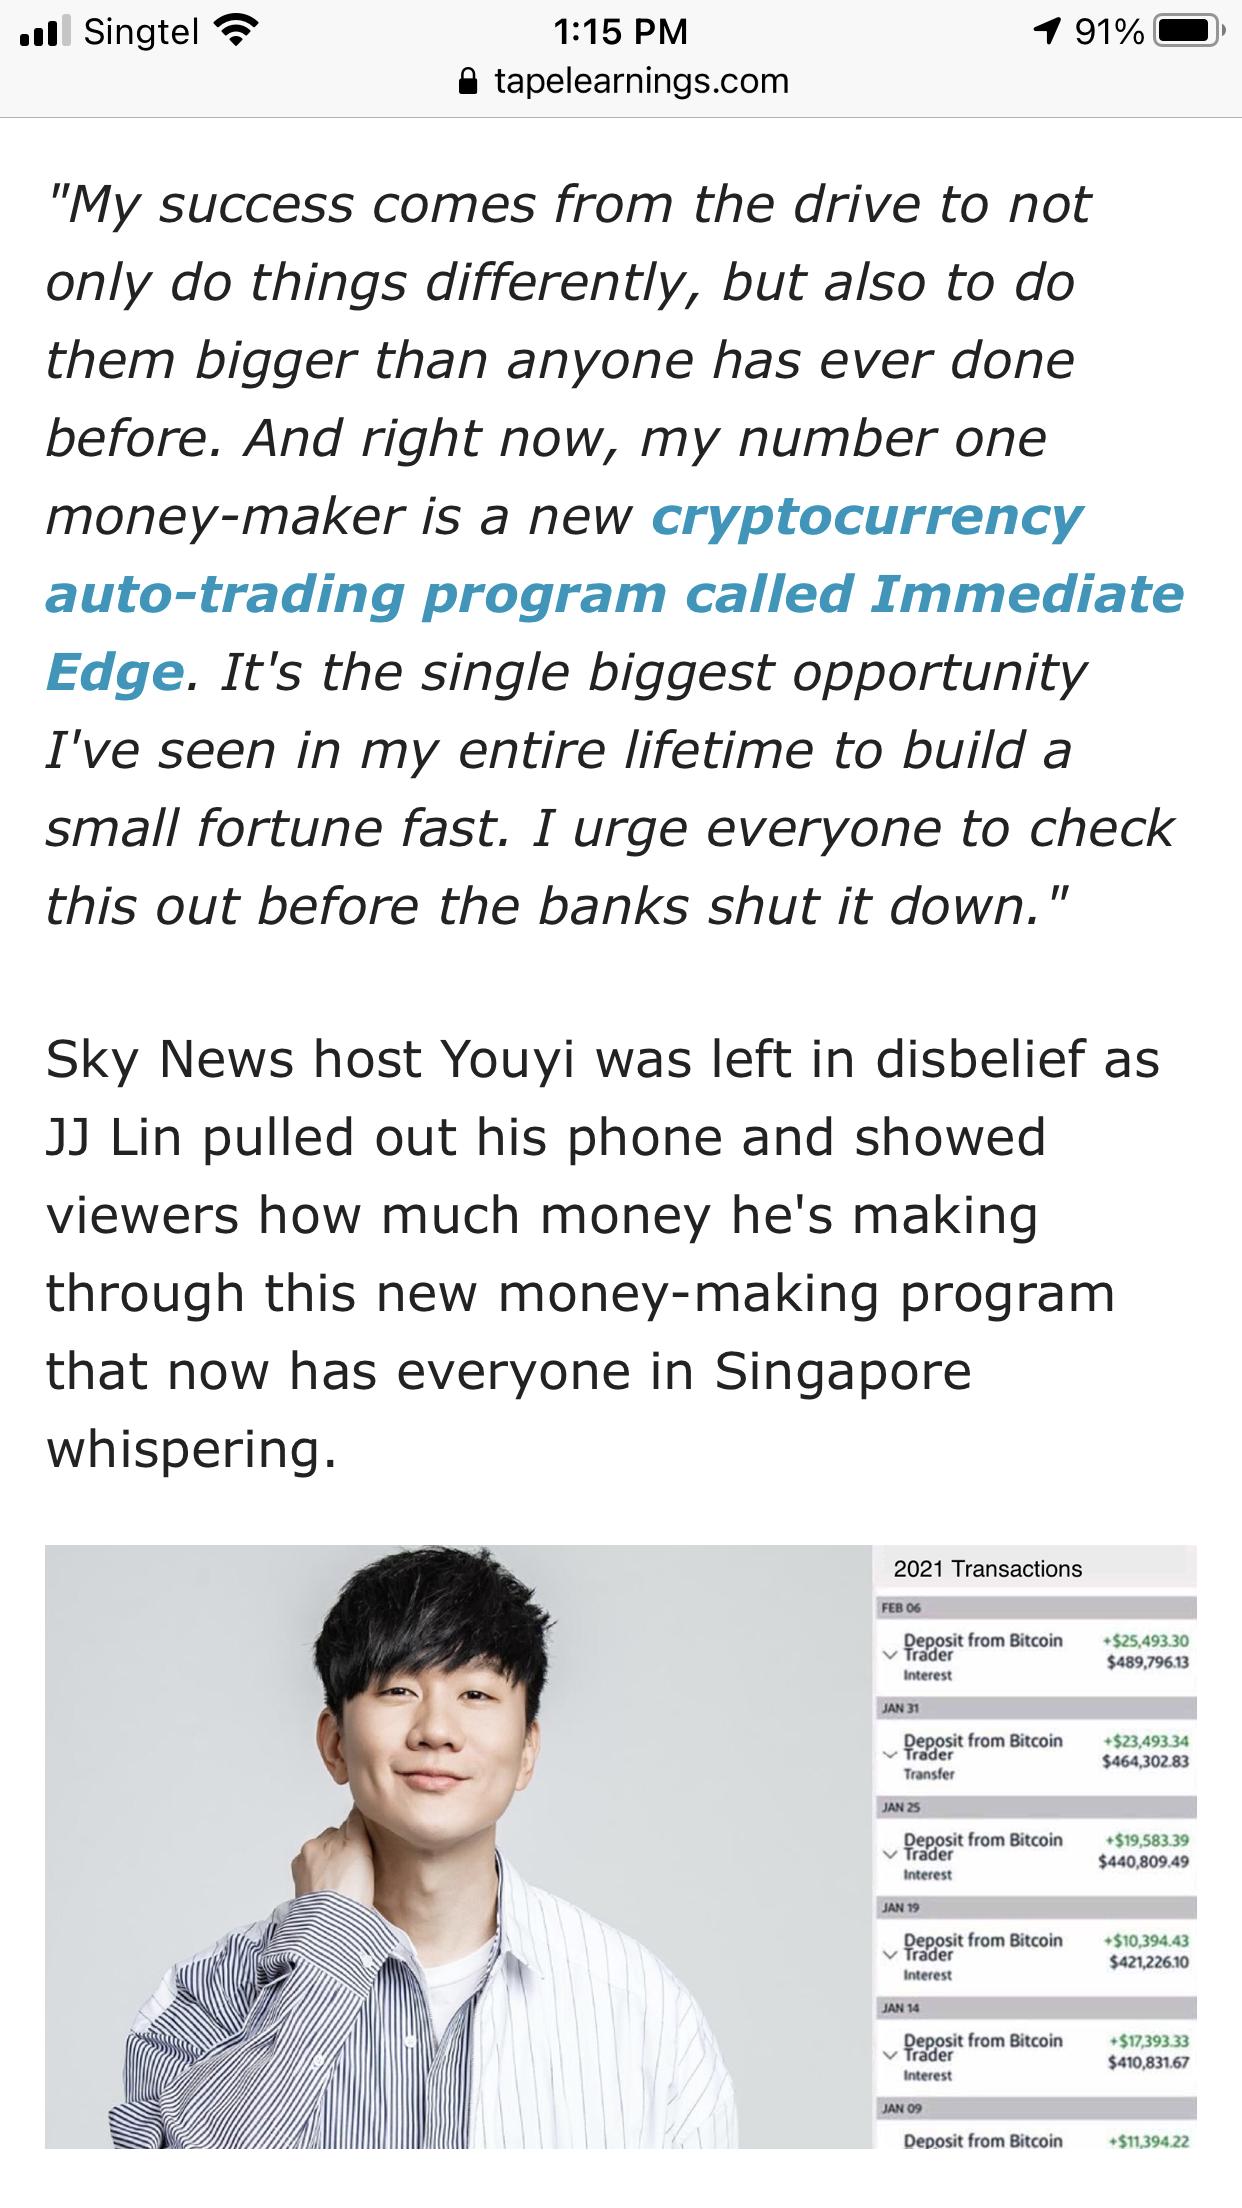 jj lin bitcoin trader)